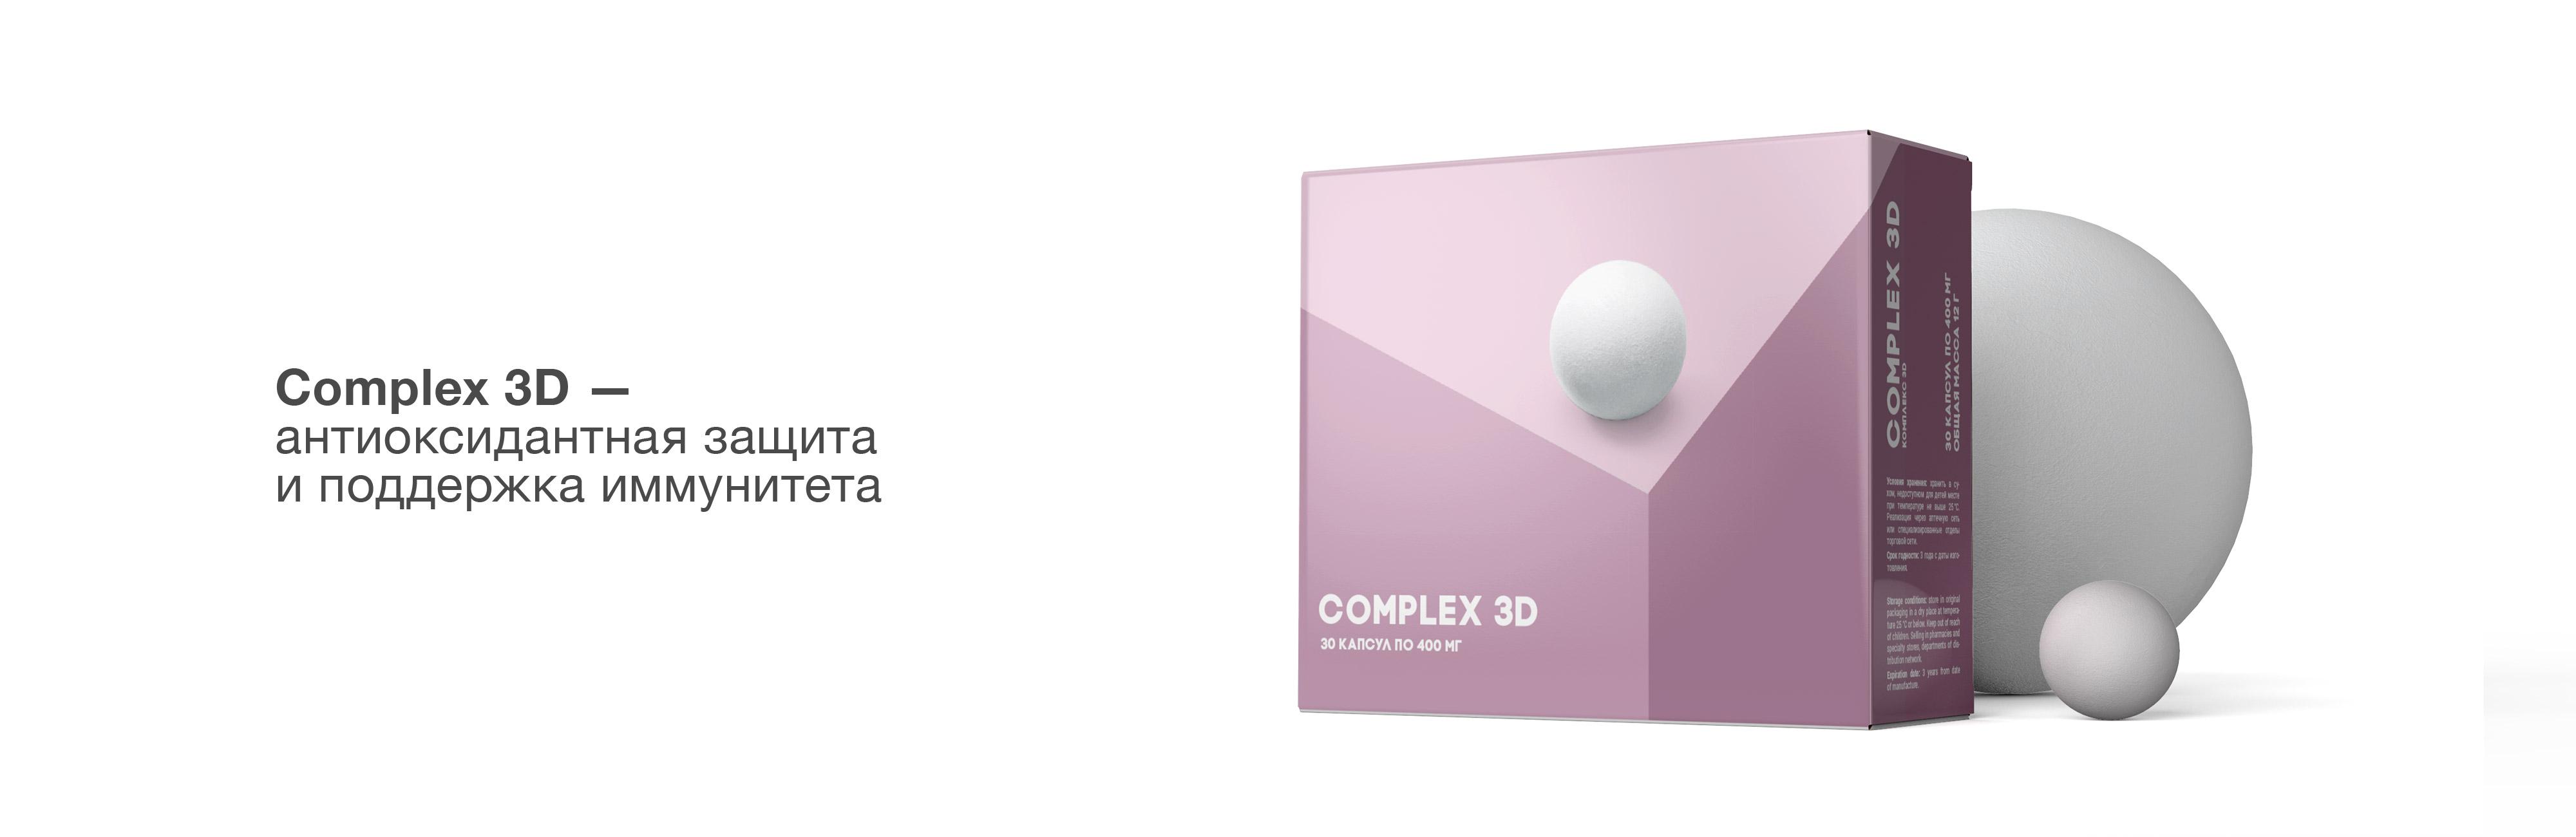 Новинка Complex 3D — мощнейший антиоксидант и детоксикант